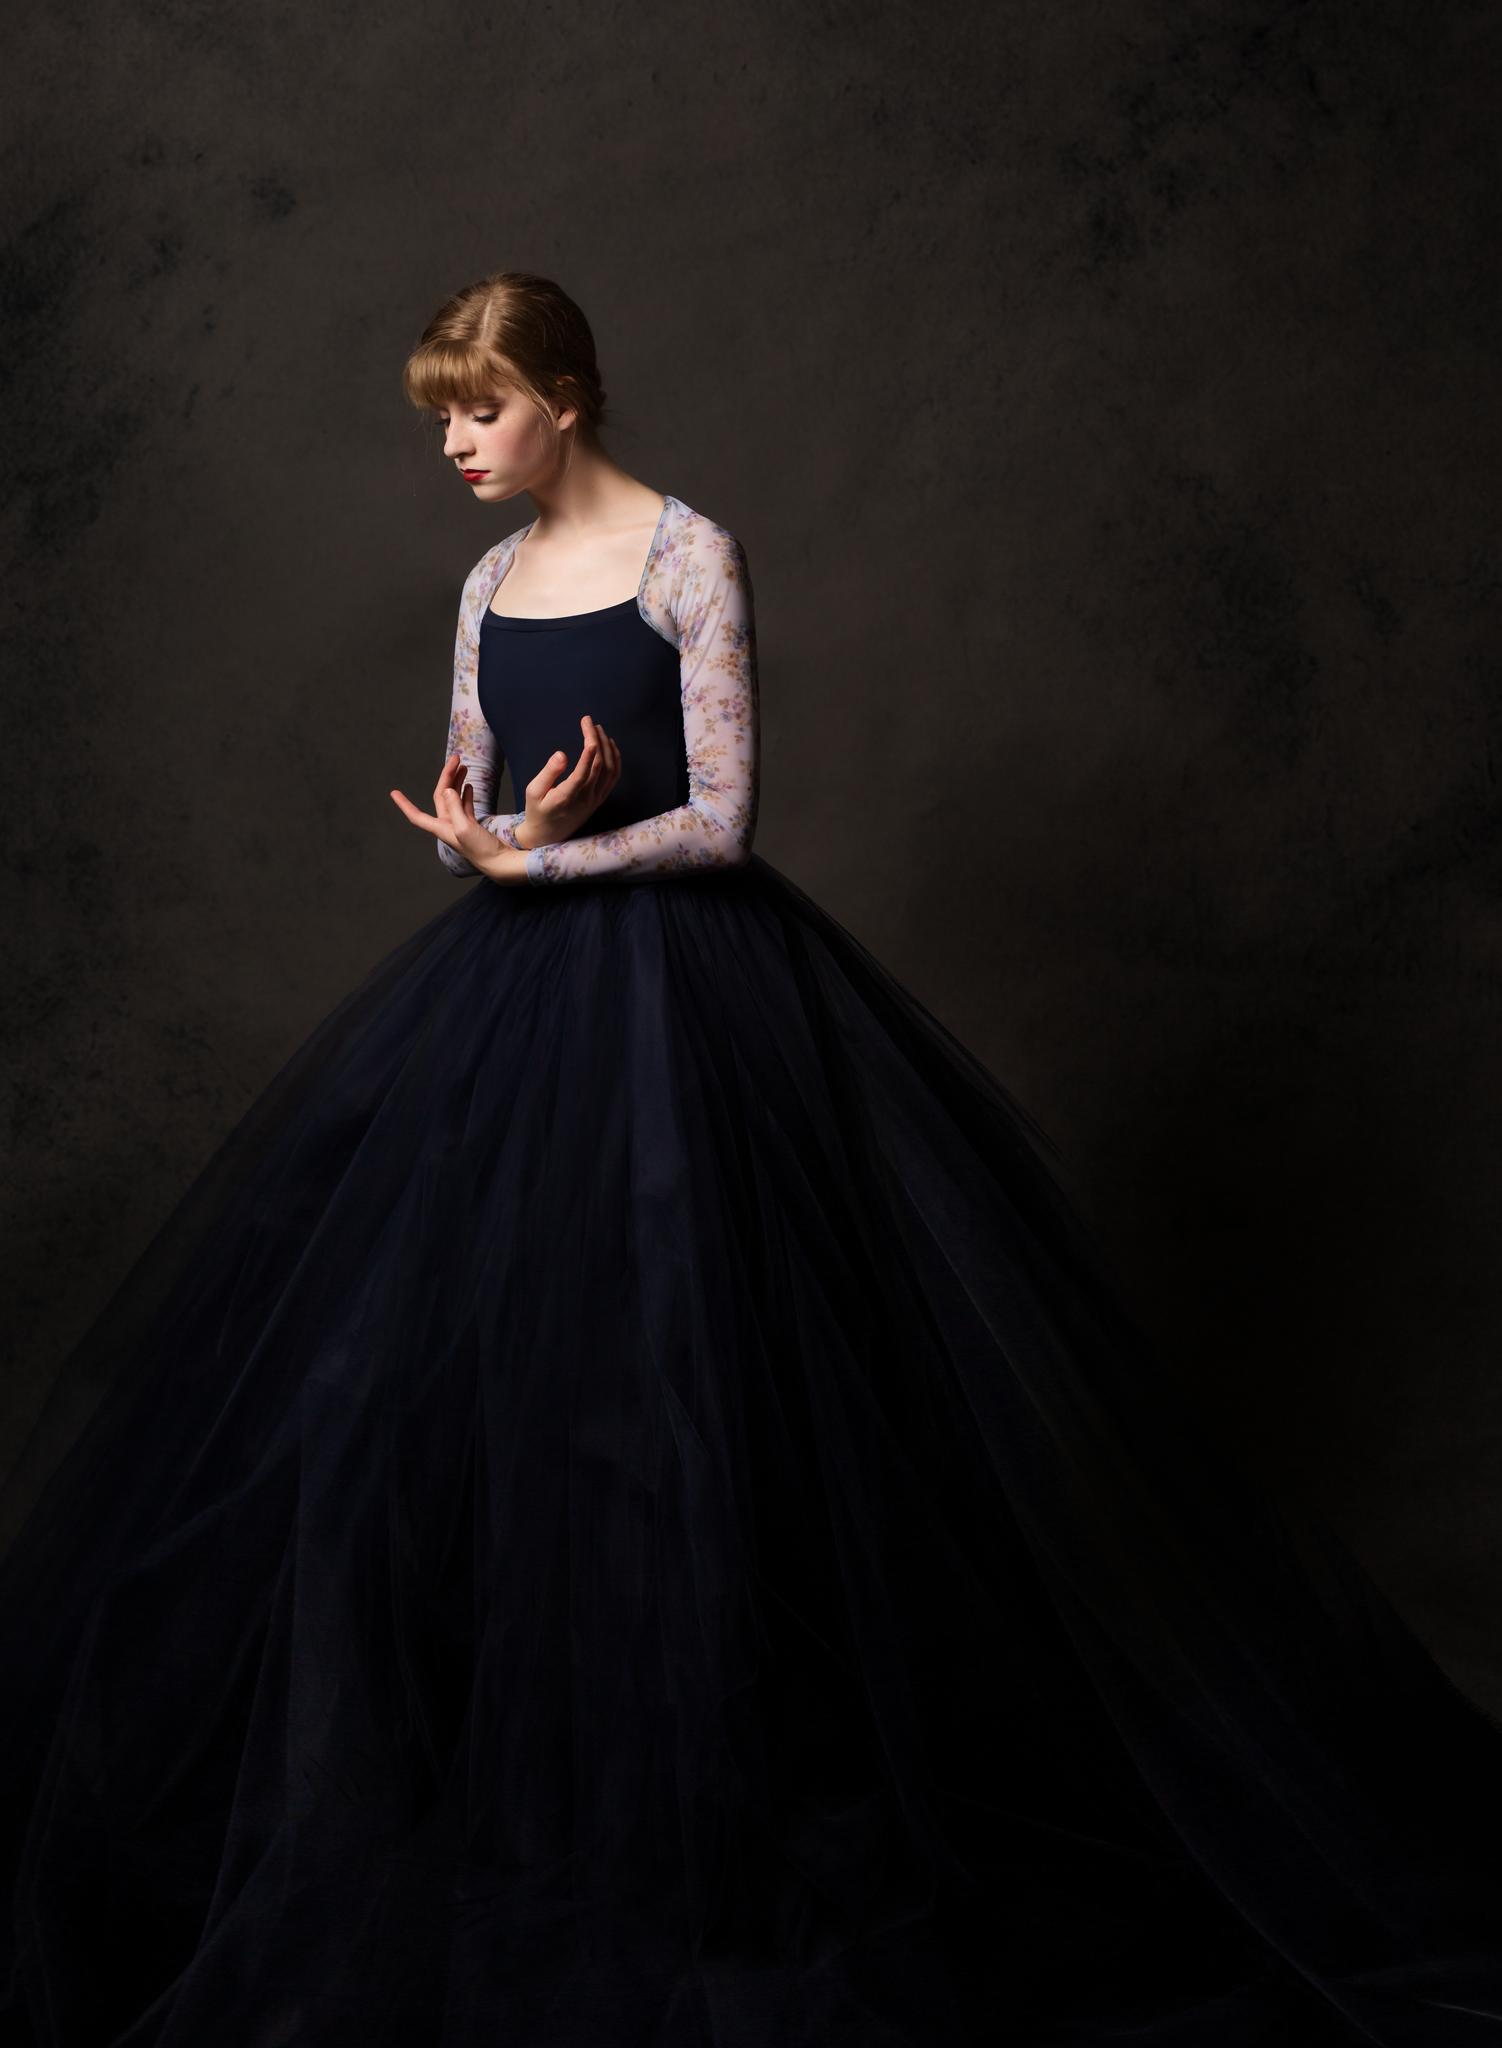 2666-Big-Claire-dress-Edit.png